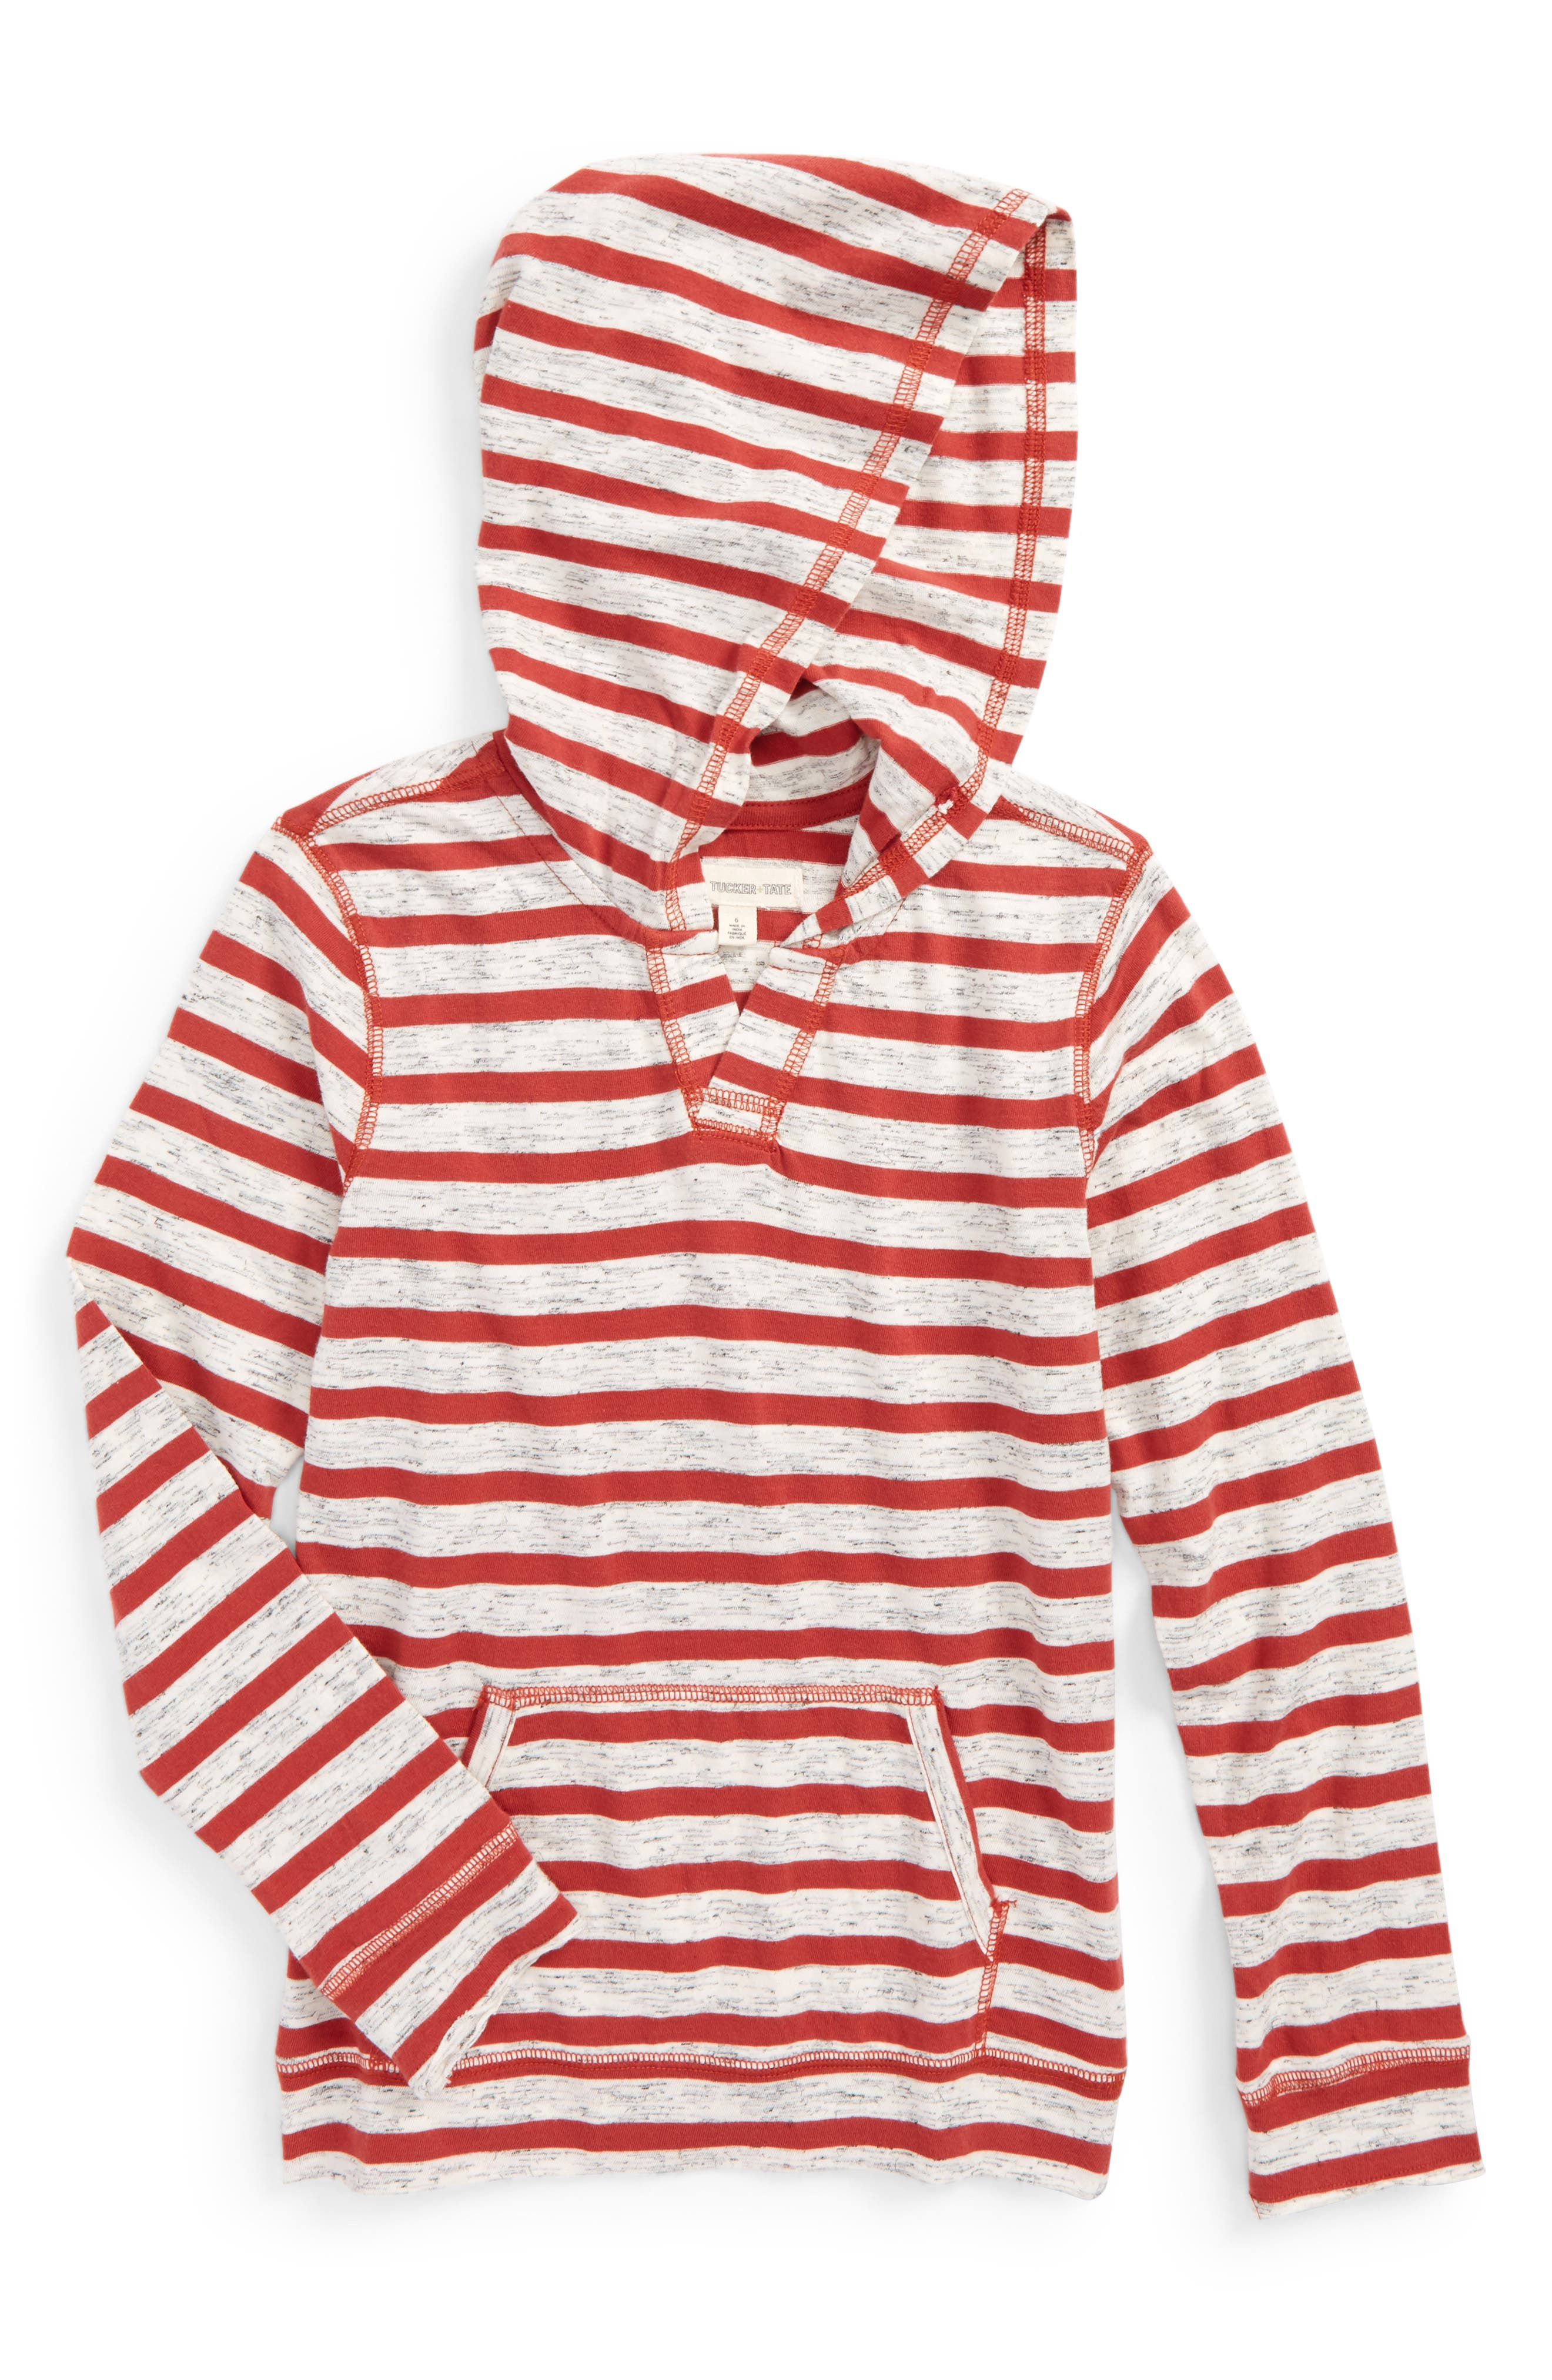 Tucker + Tate Fashion Knit Stripe Hooded T-Shirt (Toddler Boys & Little Boys)